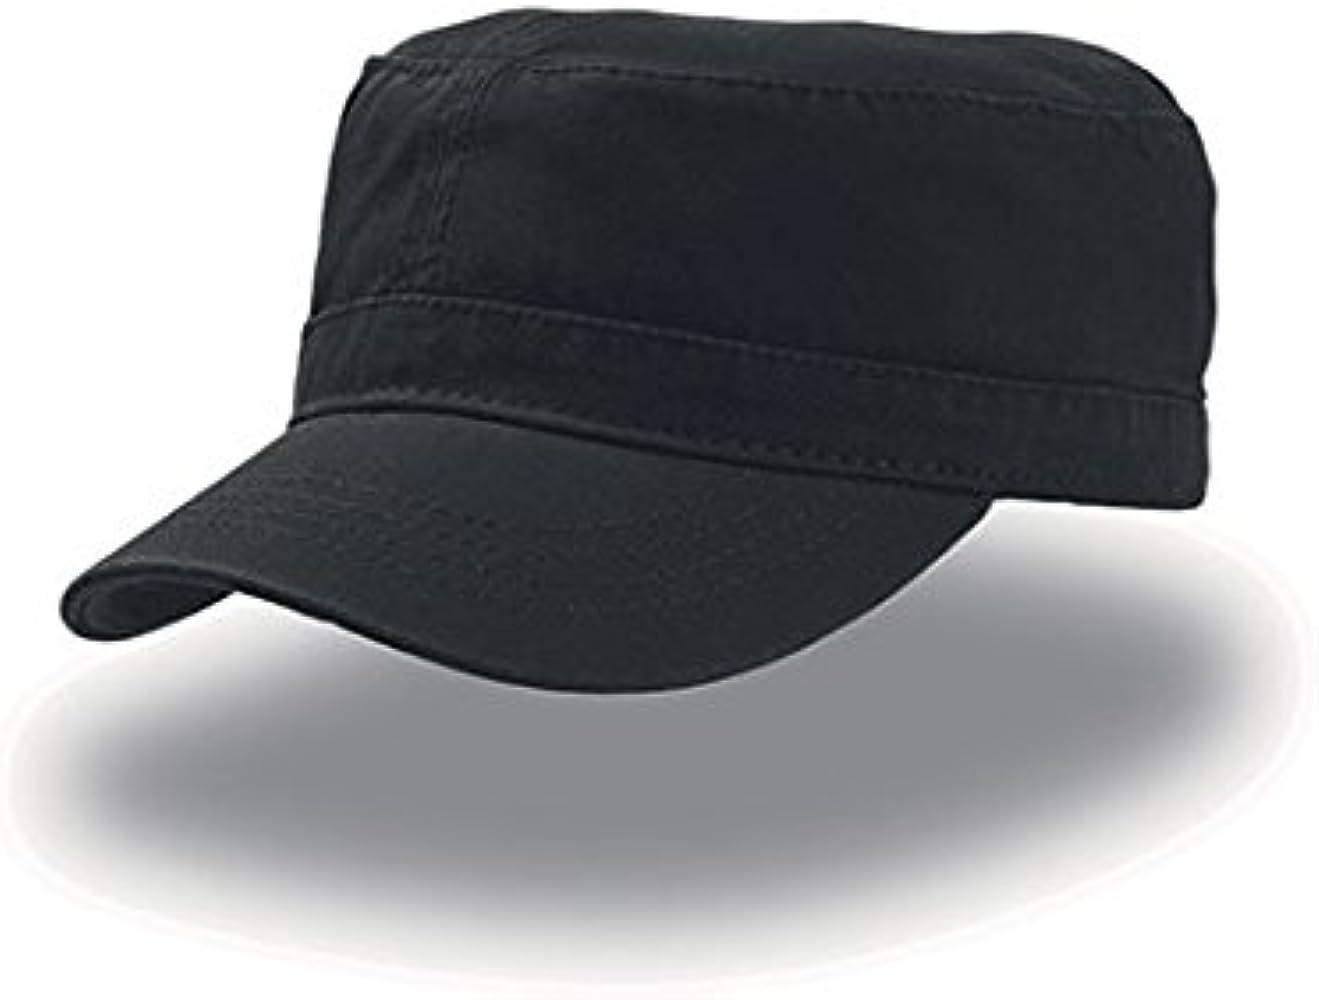 Uniform Atlantis - Gorra visera unisex color negro - Talla única ...